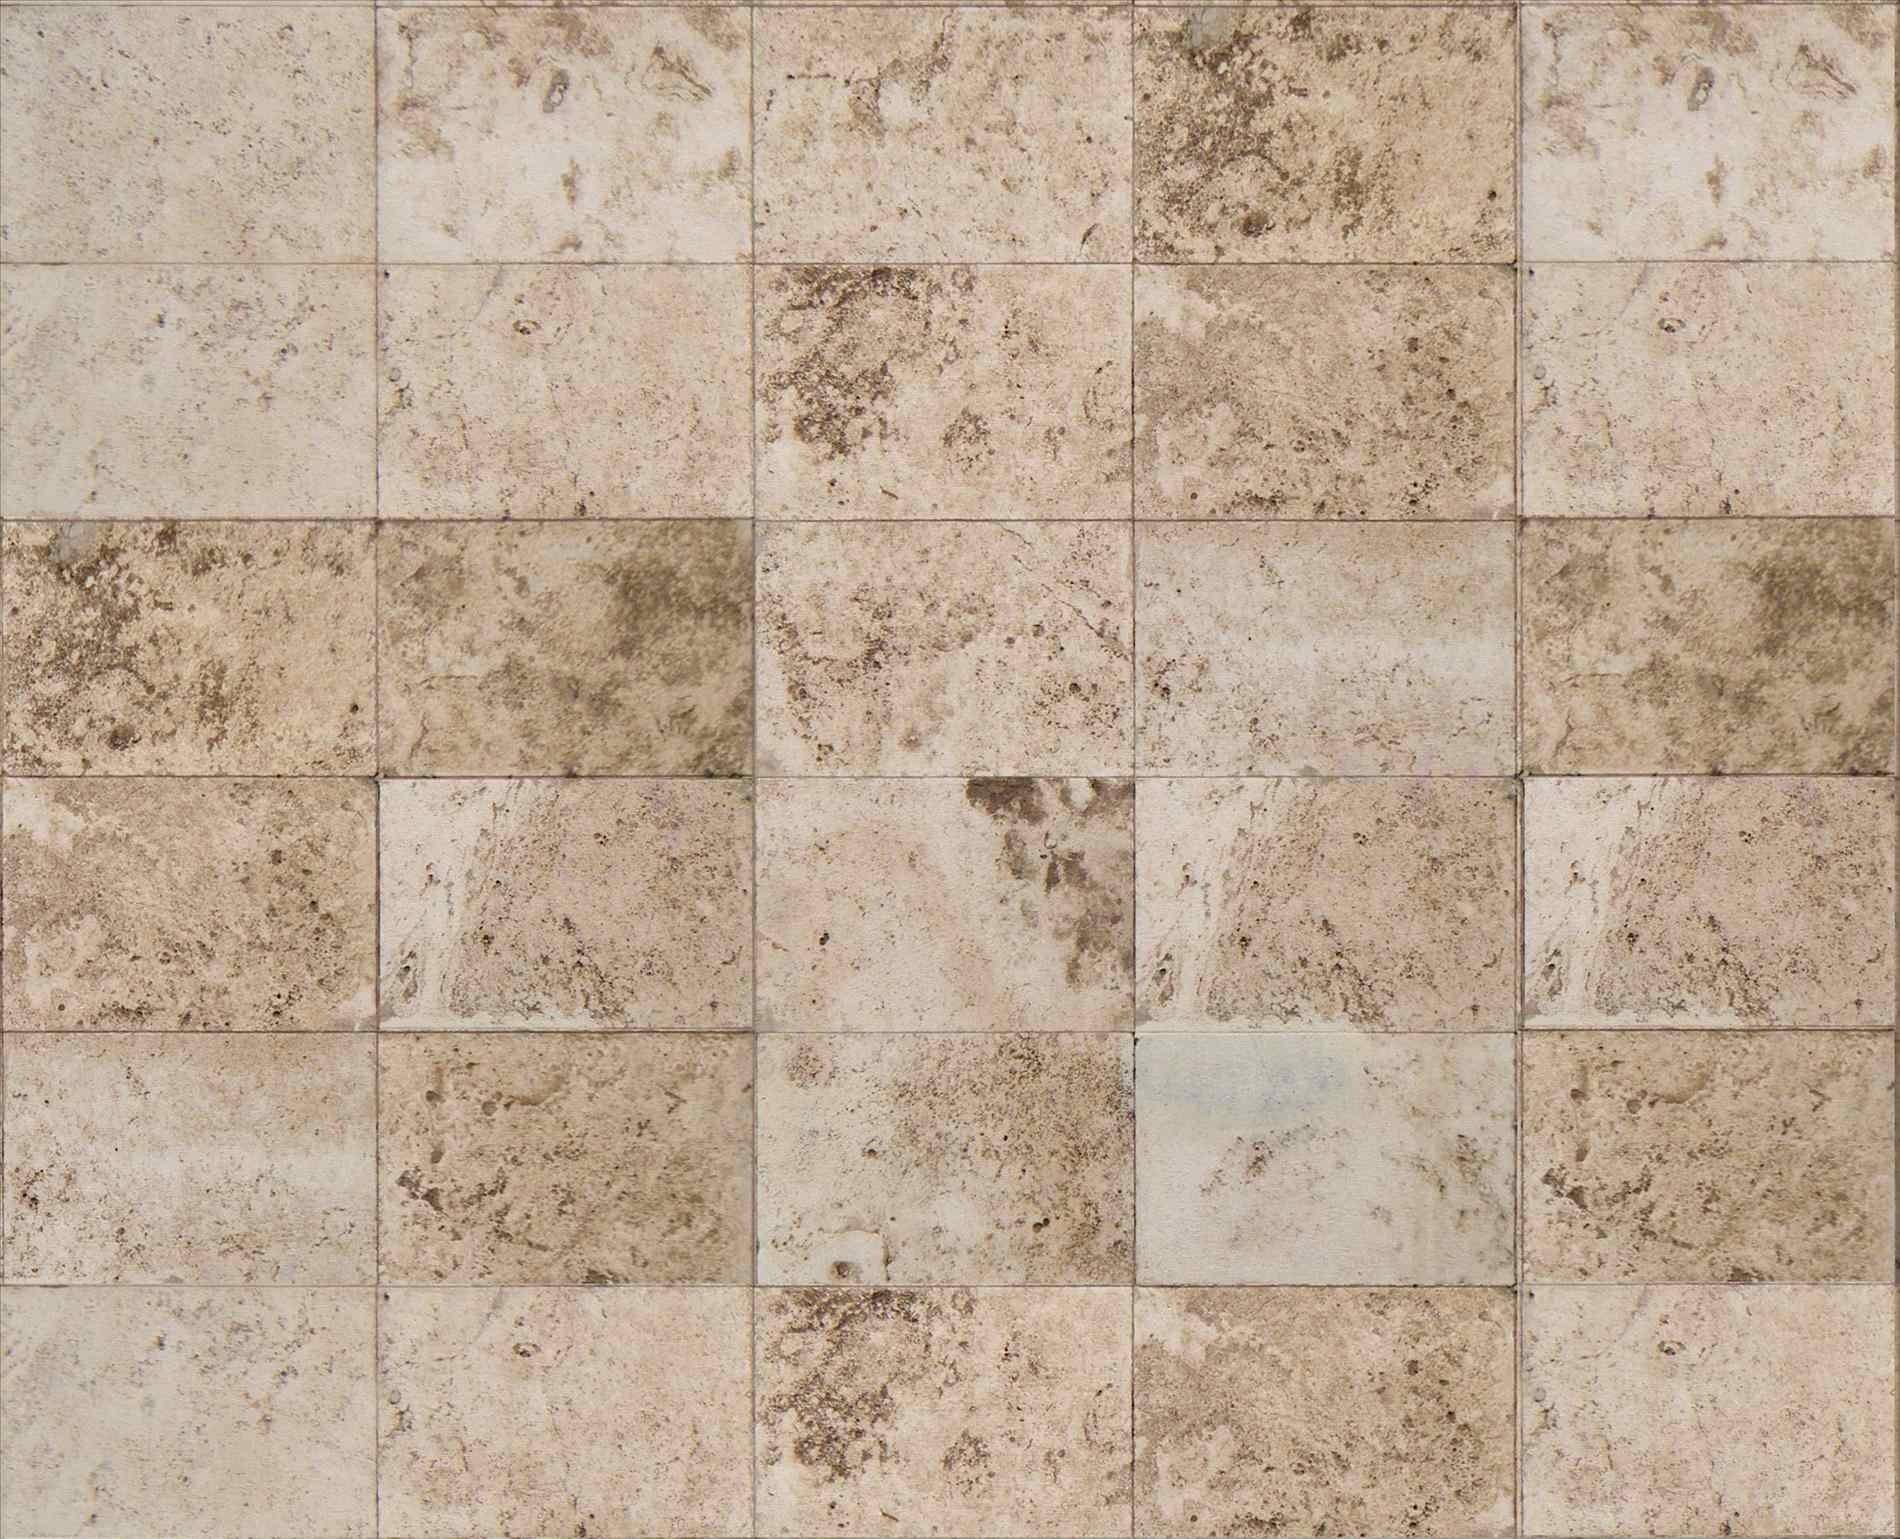 Floor Tile Texture Fresh White Floor Tiles Texture Luxury Ceramic ...